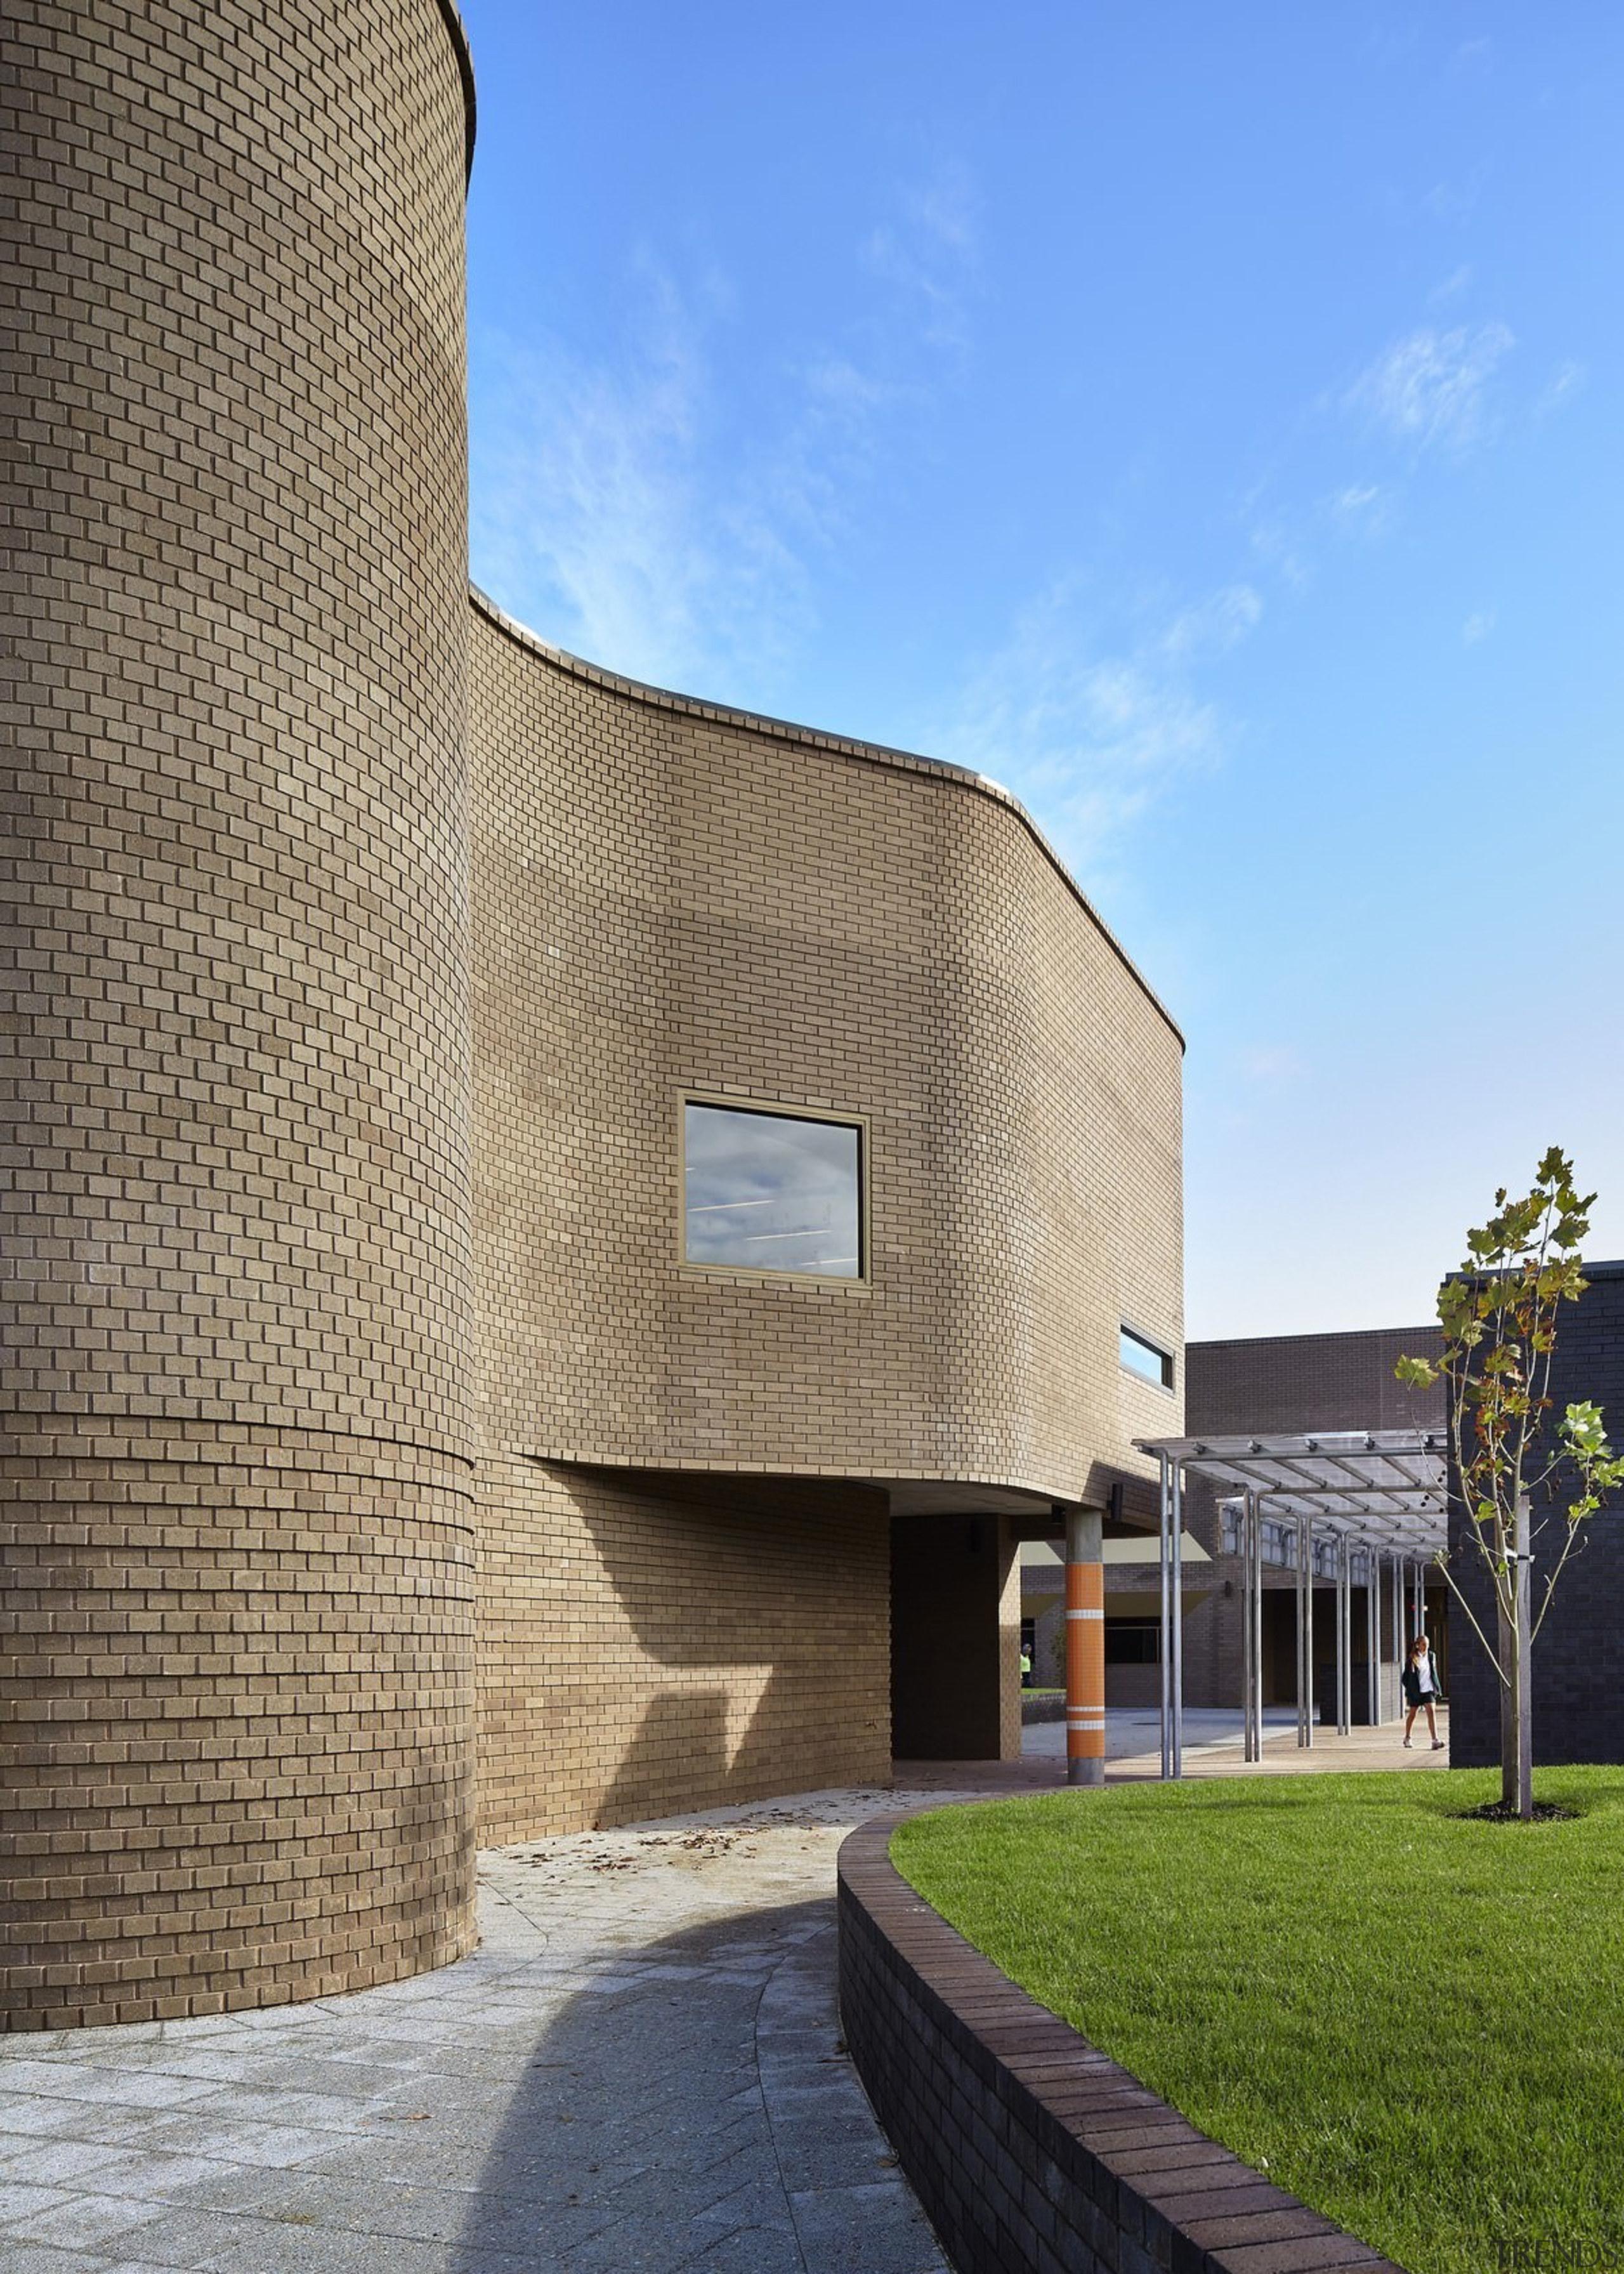 Bunbury Catholic College – Mercy Campus - Bunbury architecture, building, facade, house, real estate, sky, teal